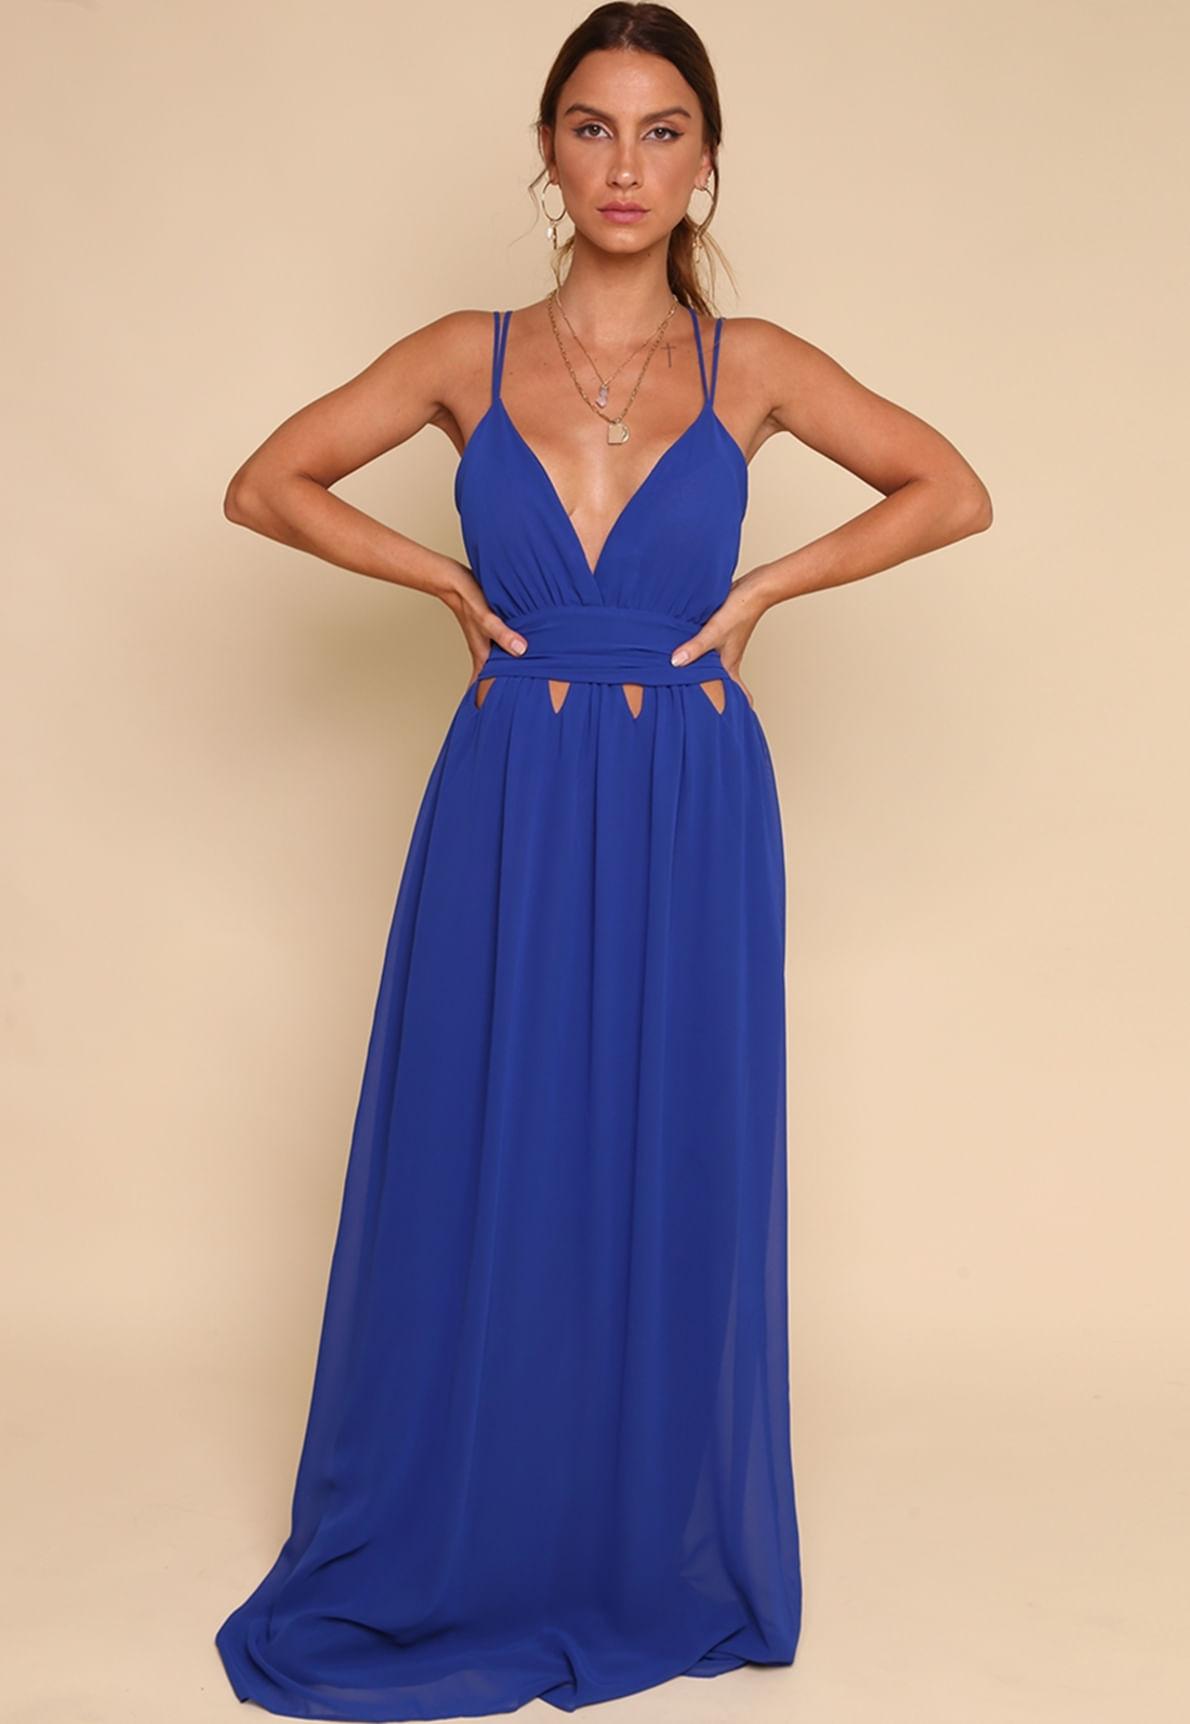 23211-vestido-longo-azul-royal-sandra-01